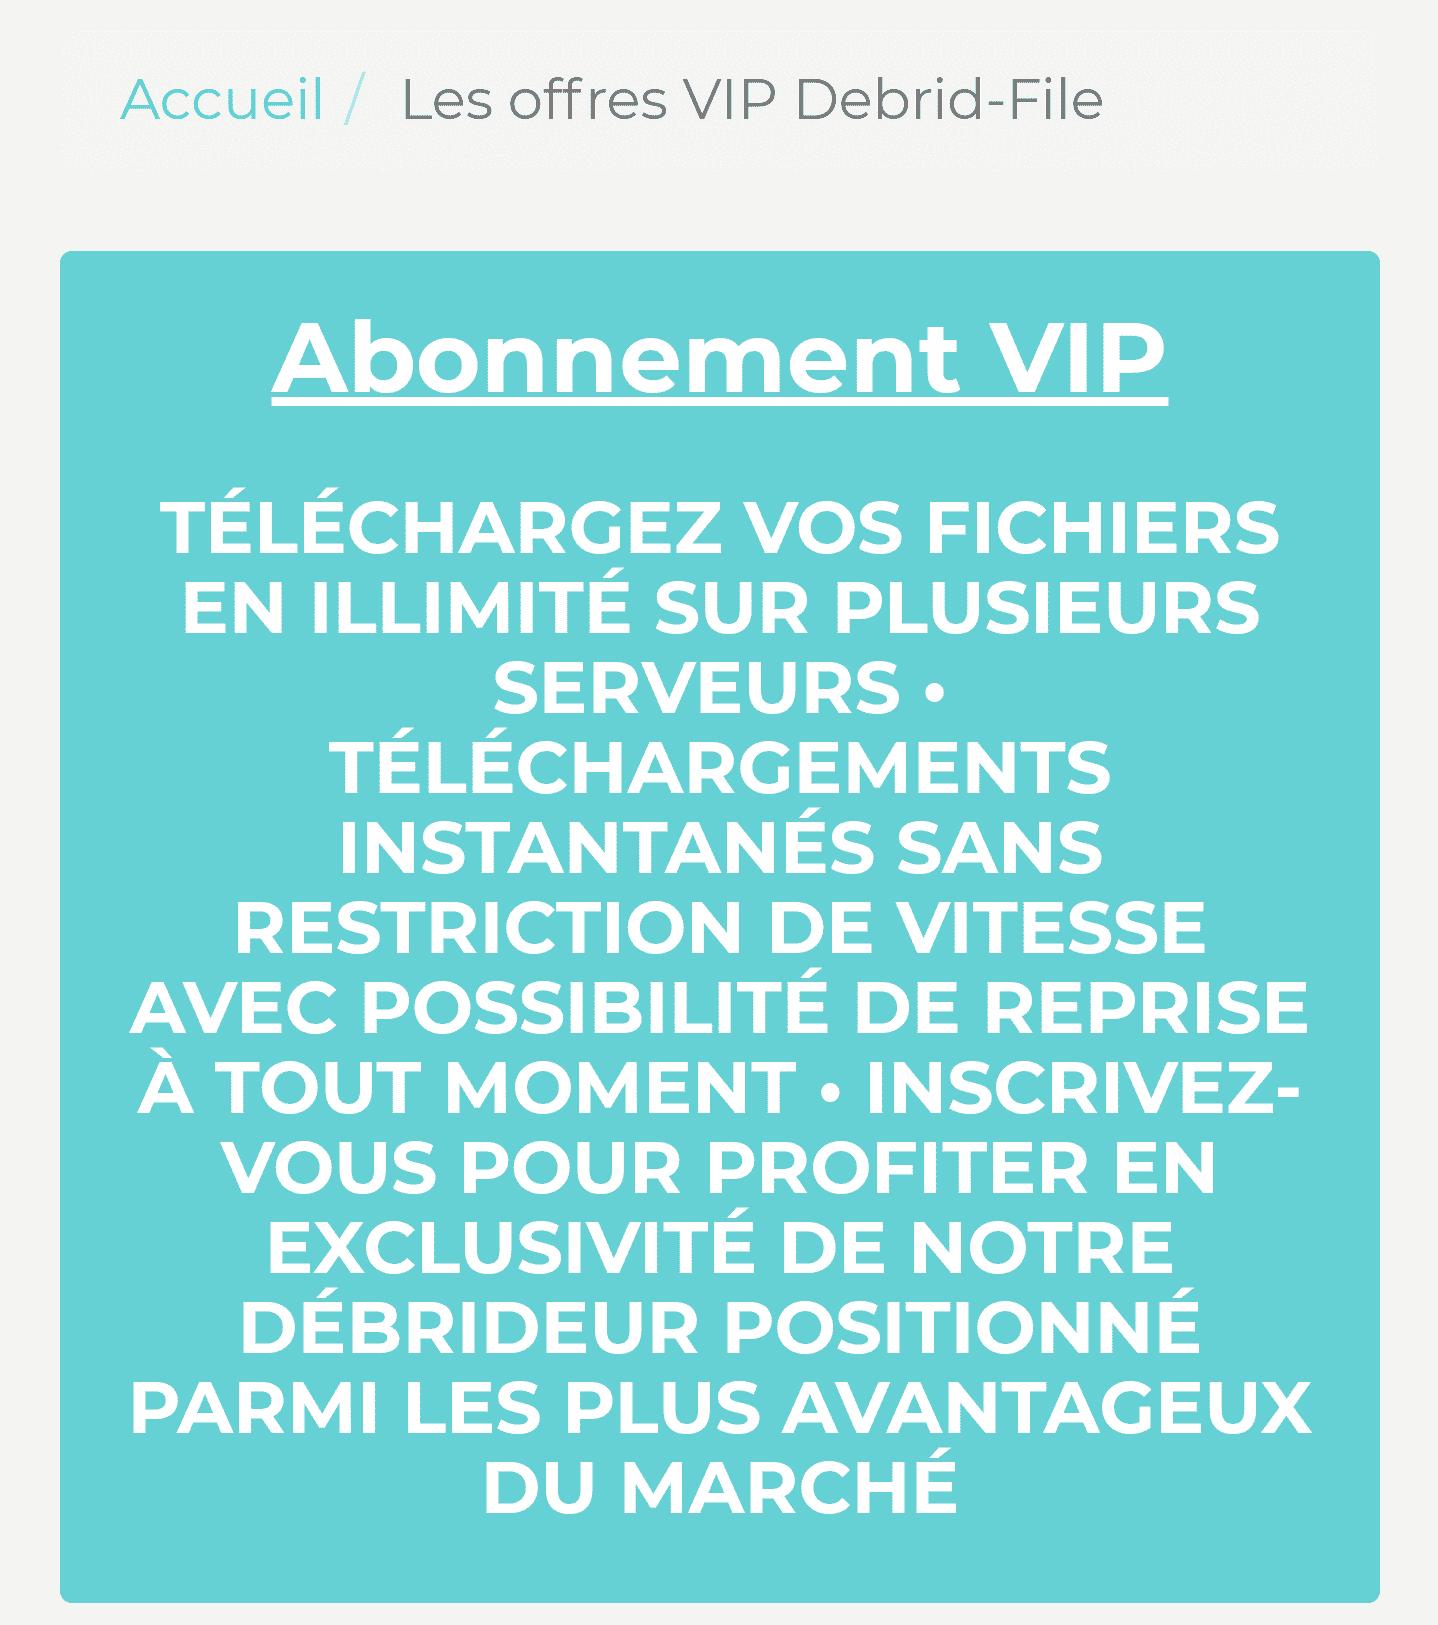 debrid file VIP